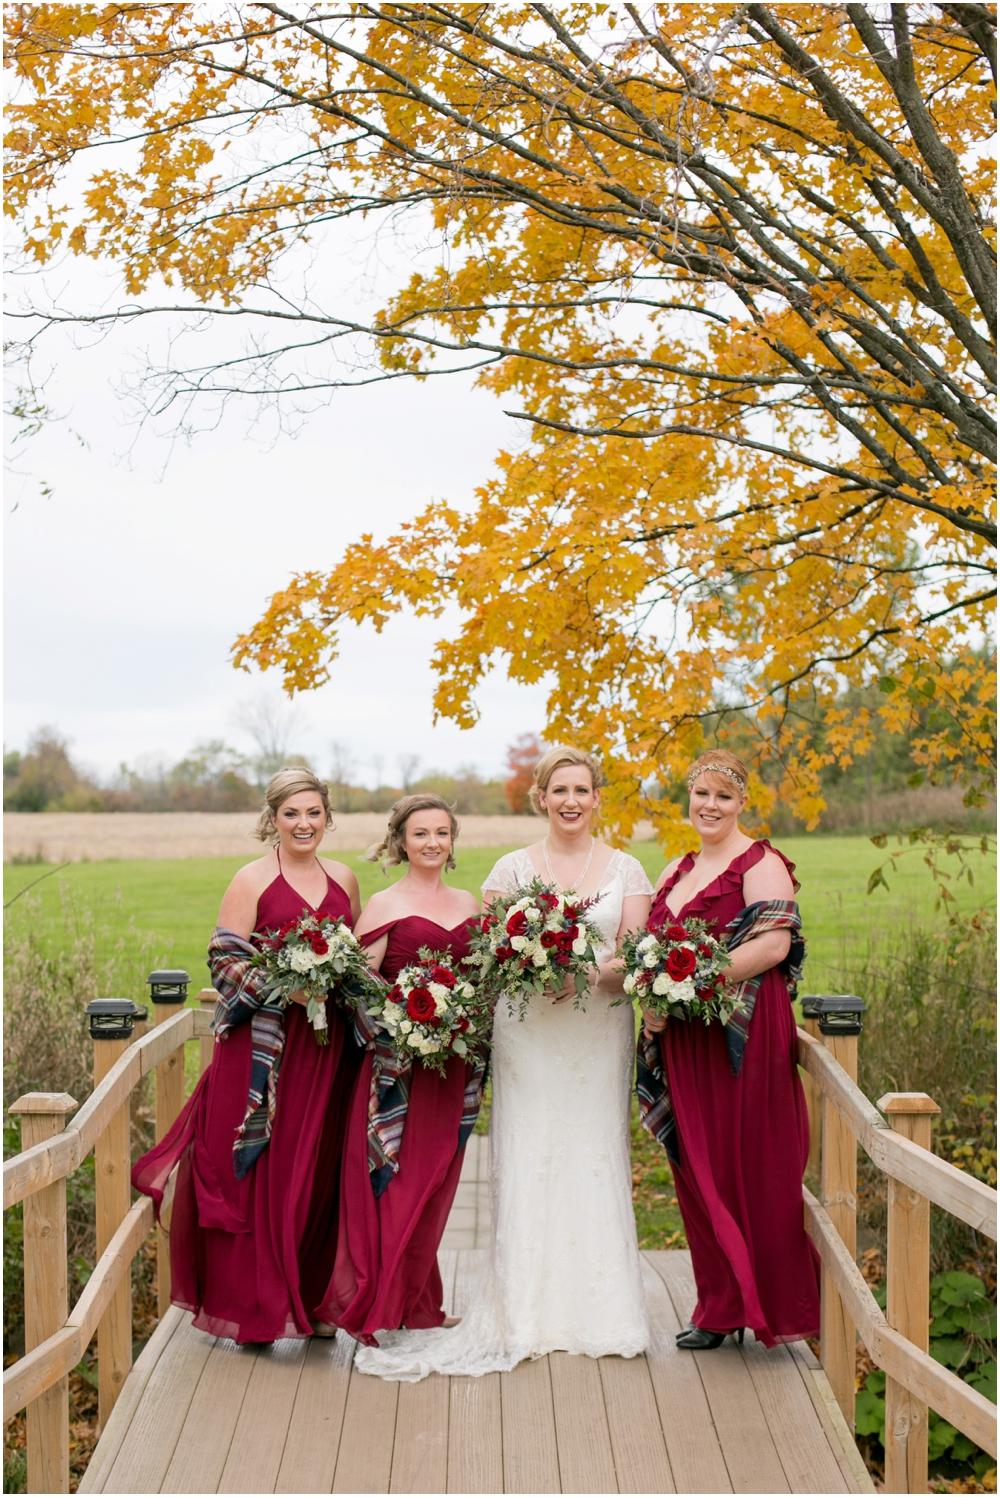 Halifax-Wedding-Show-Chantal-Routhier-Photography_0011.jpg